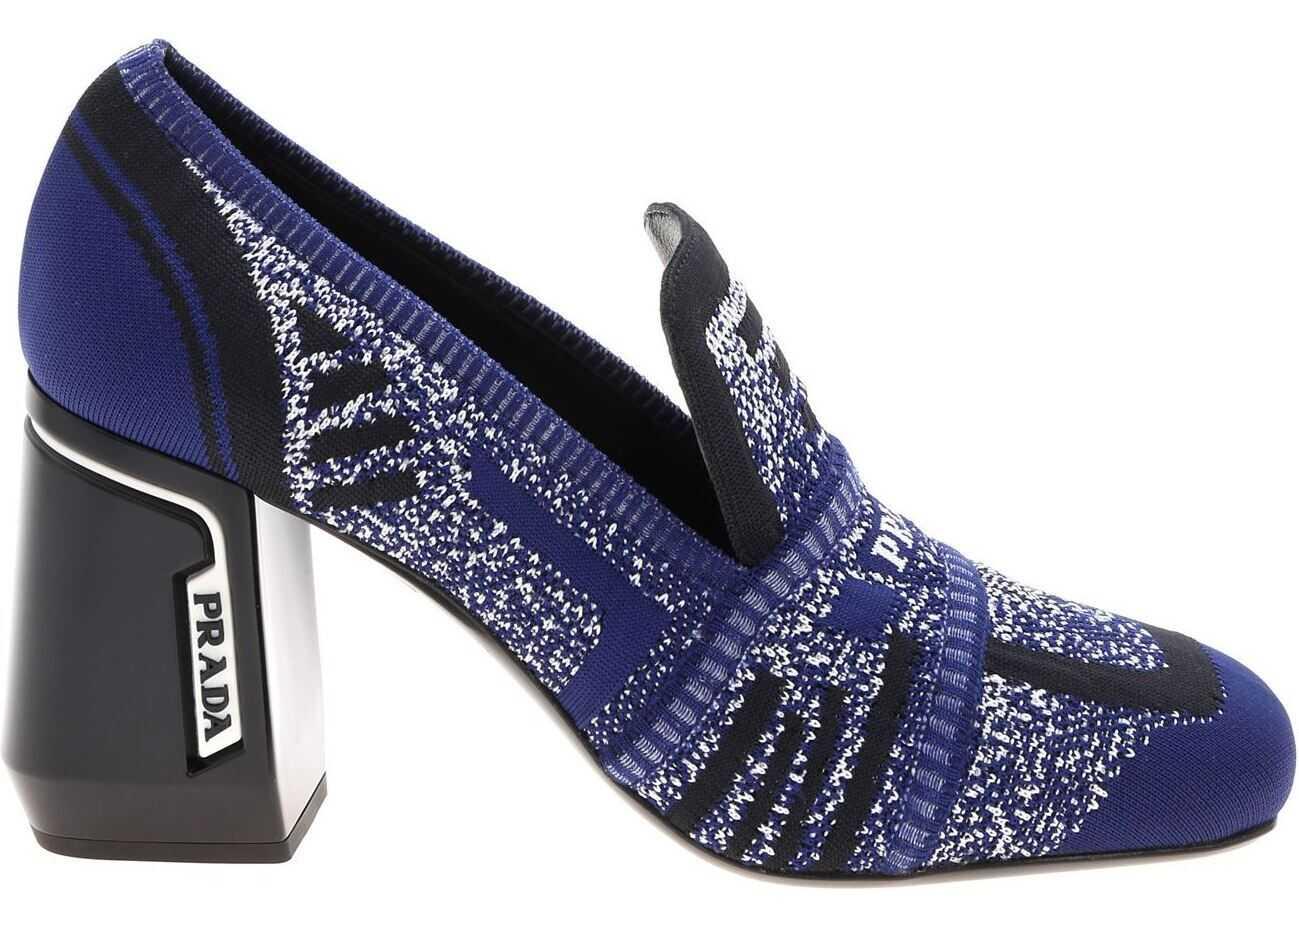 Prada Décolleté In Blue Knit Fabric Blue